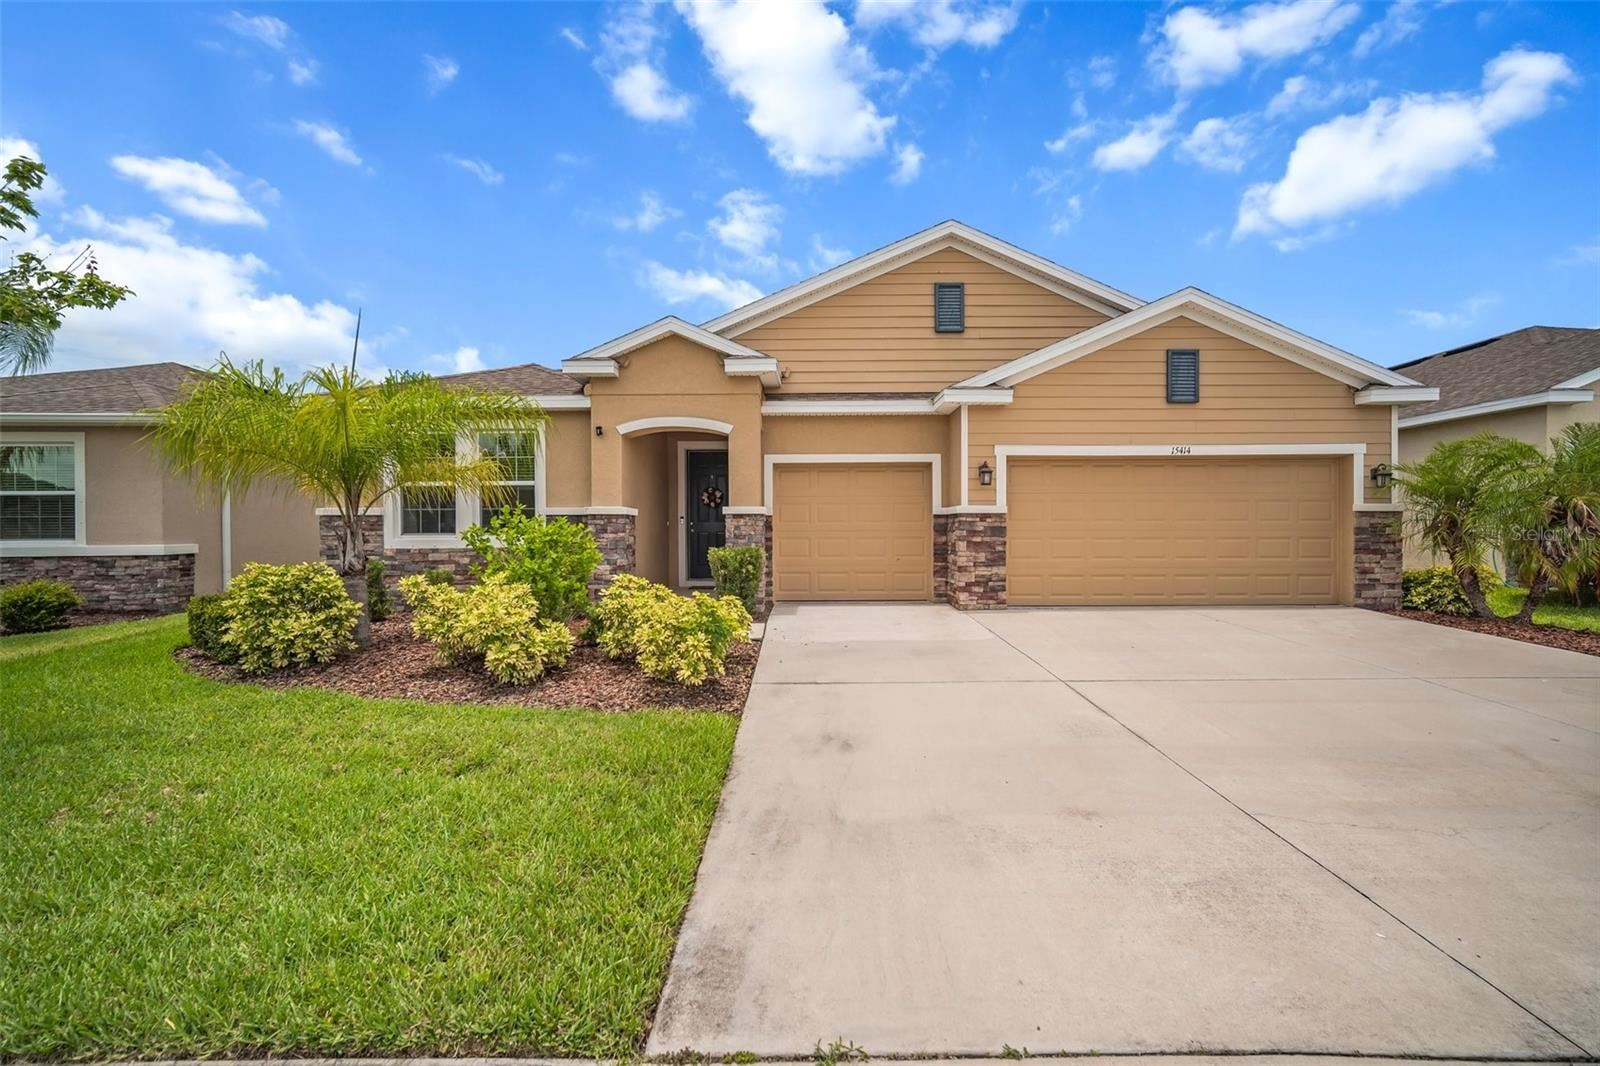 Photo of 15414 HIGH BELL PLACE, BRADENTON, FL 34212 (MLS # T3314341)